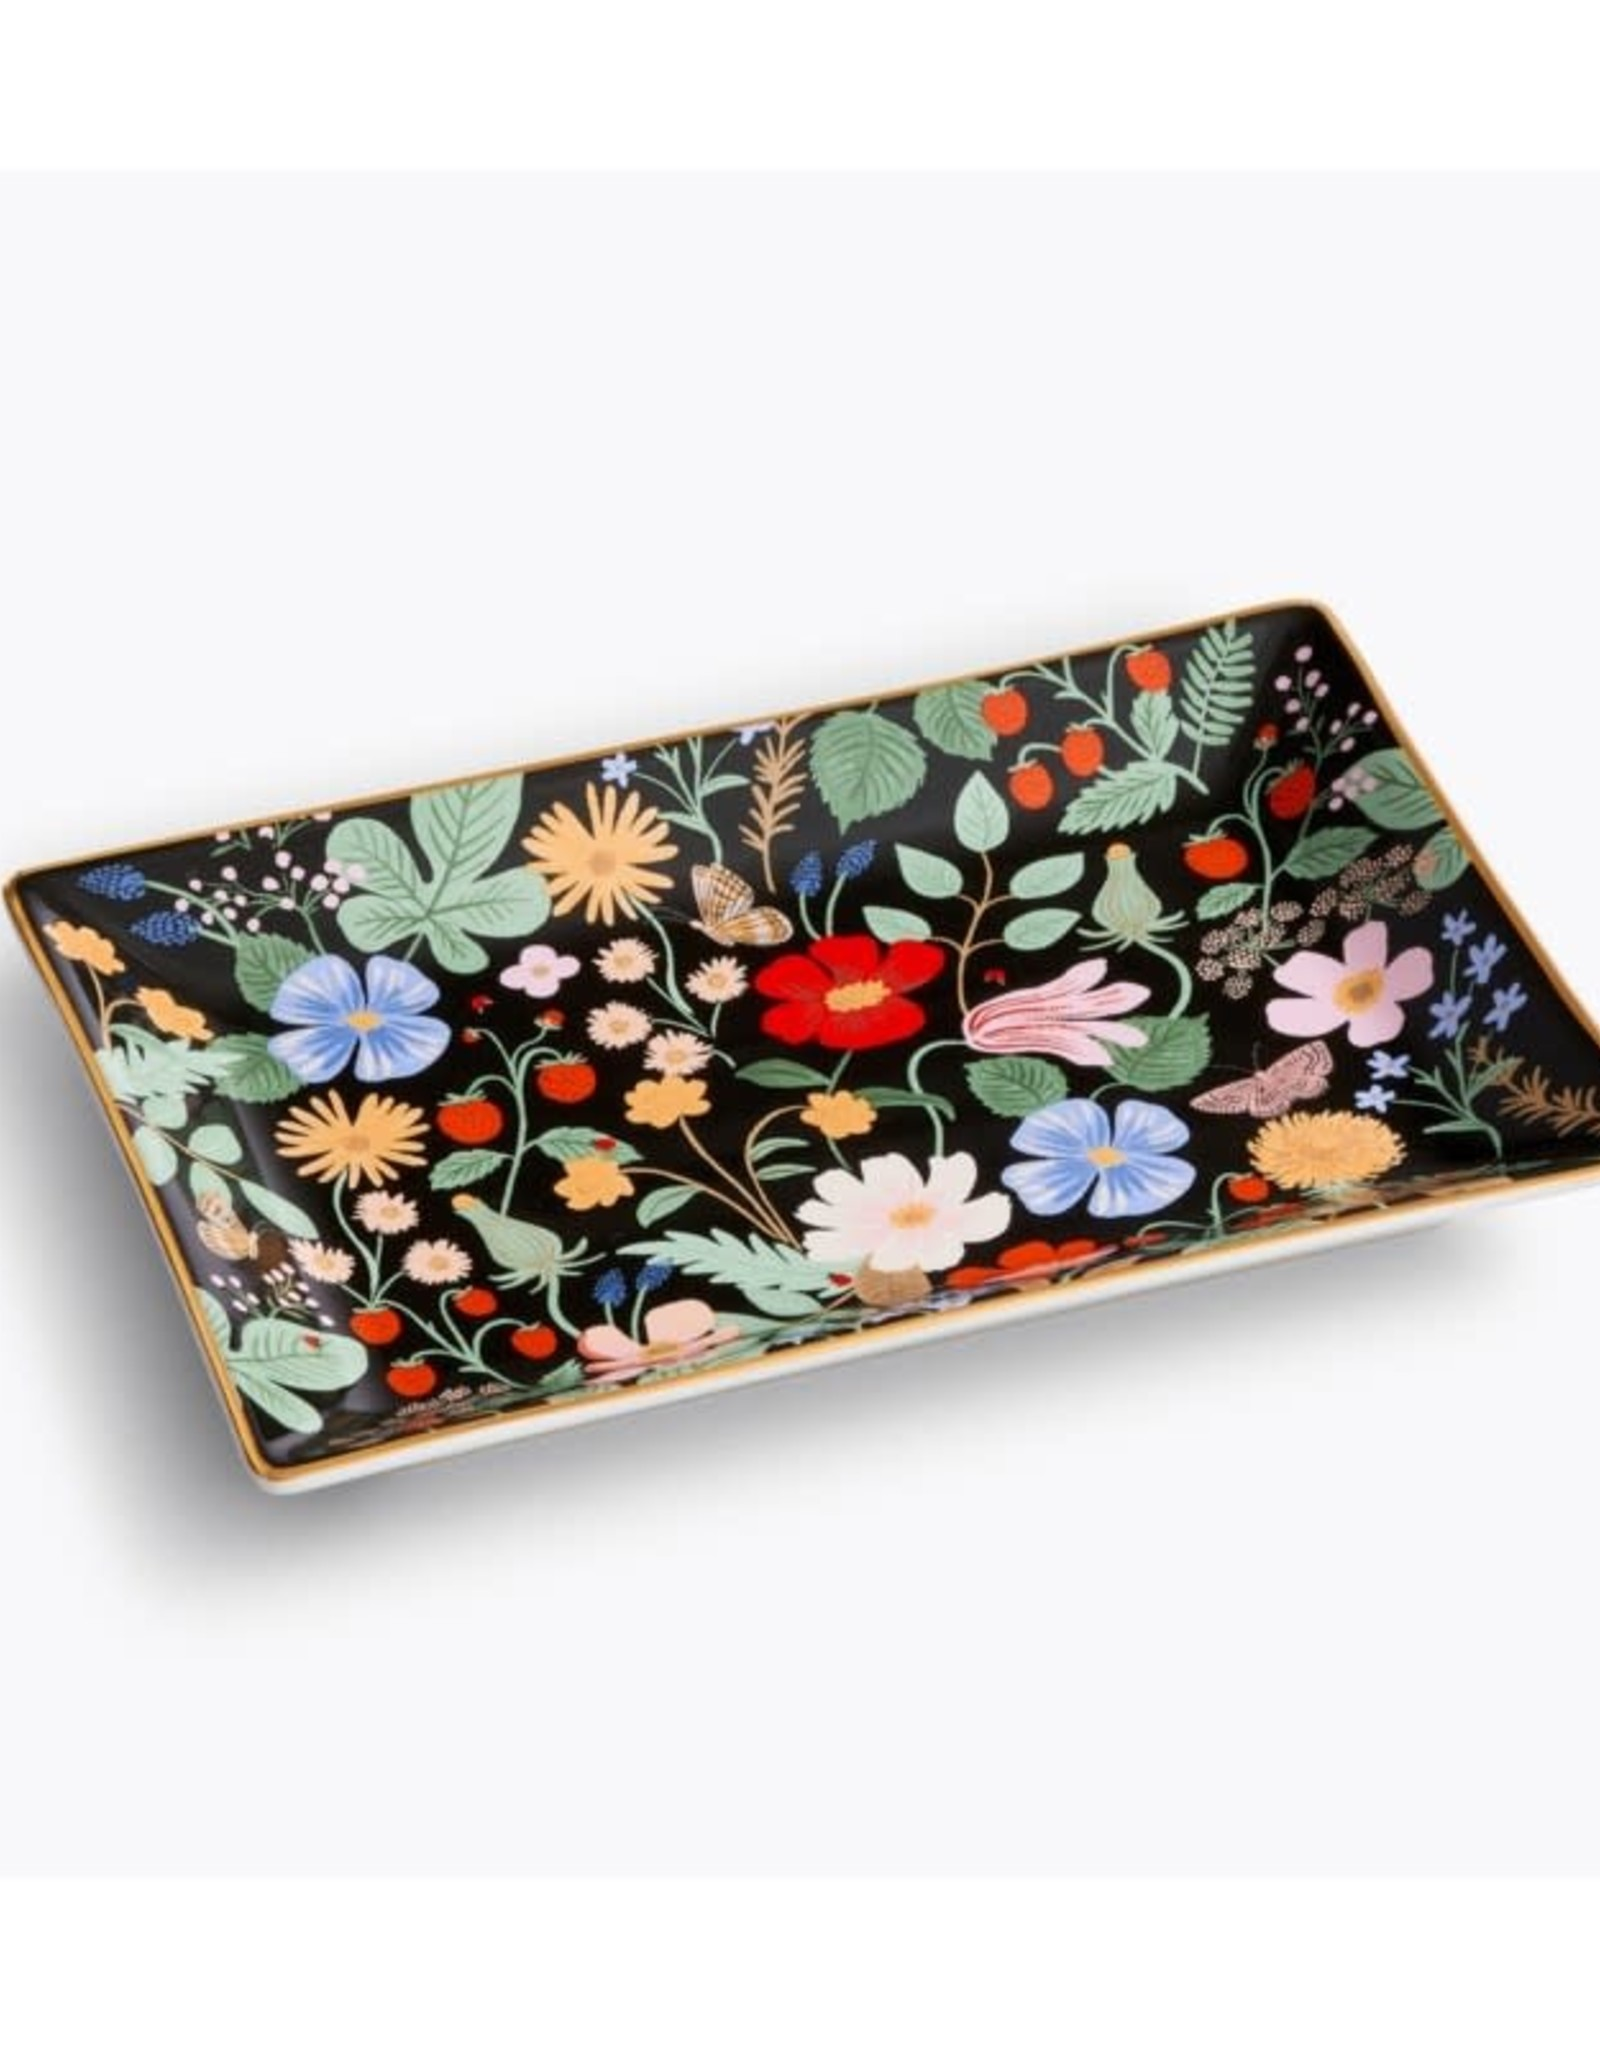 Riffle Paper Co. Catchall Tray - Strawberry Fields